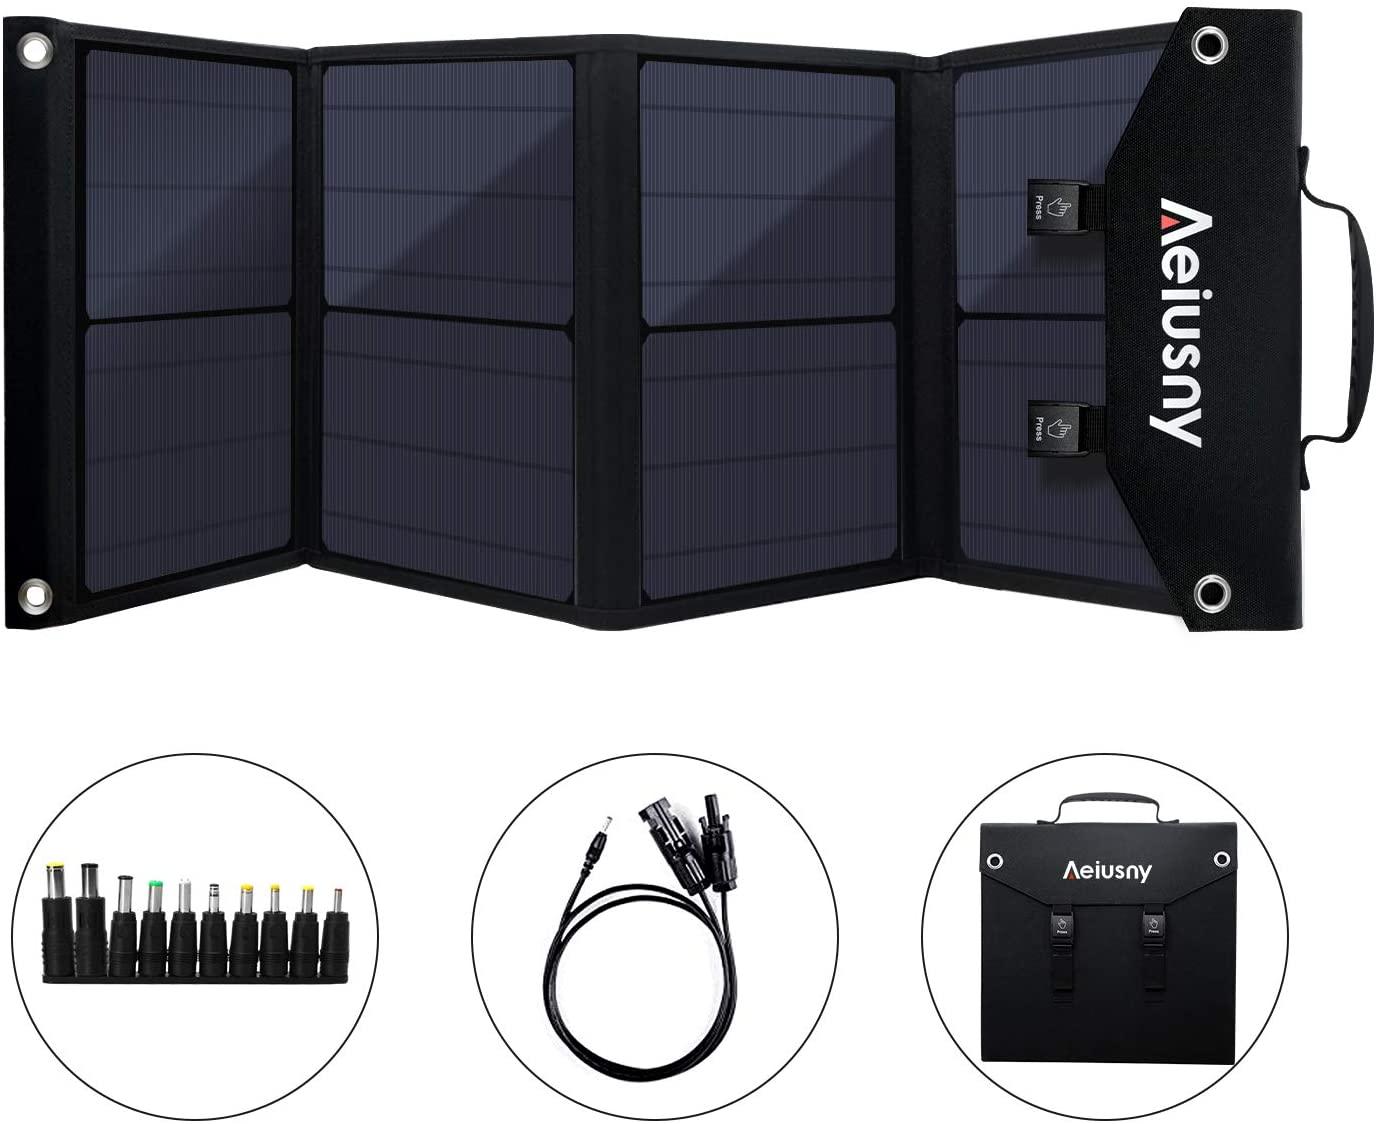 Aeiusny 60W Foldable Portable Solar Charger